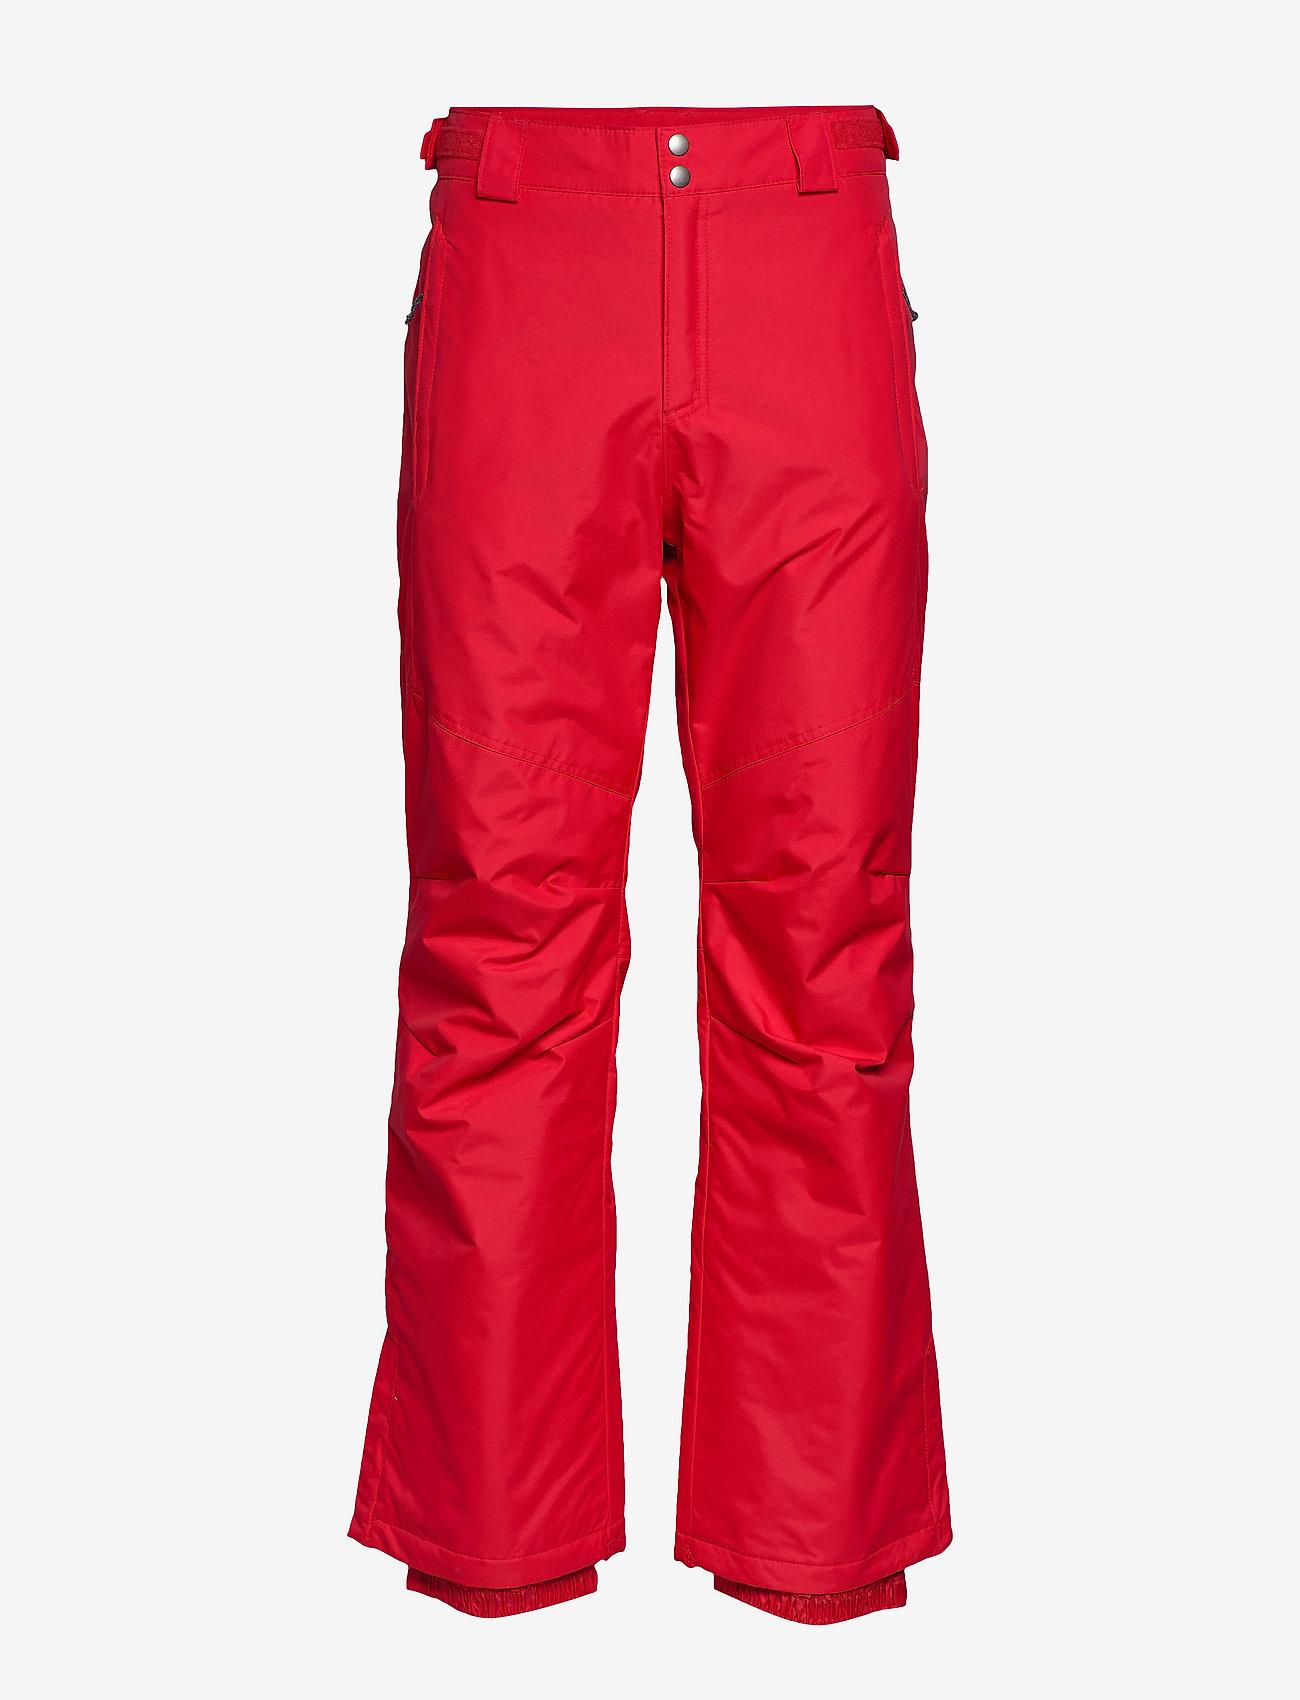 Columbia - Bugaboo IV Pant - spodnie narciarskie - mountain red - 0